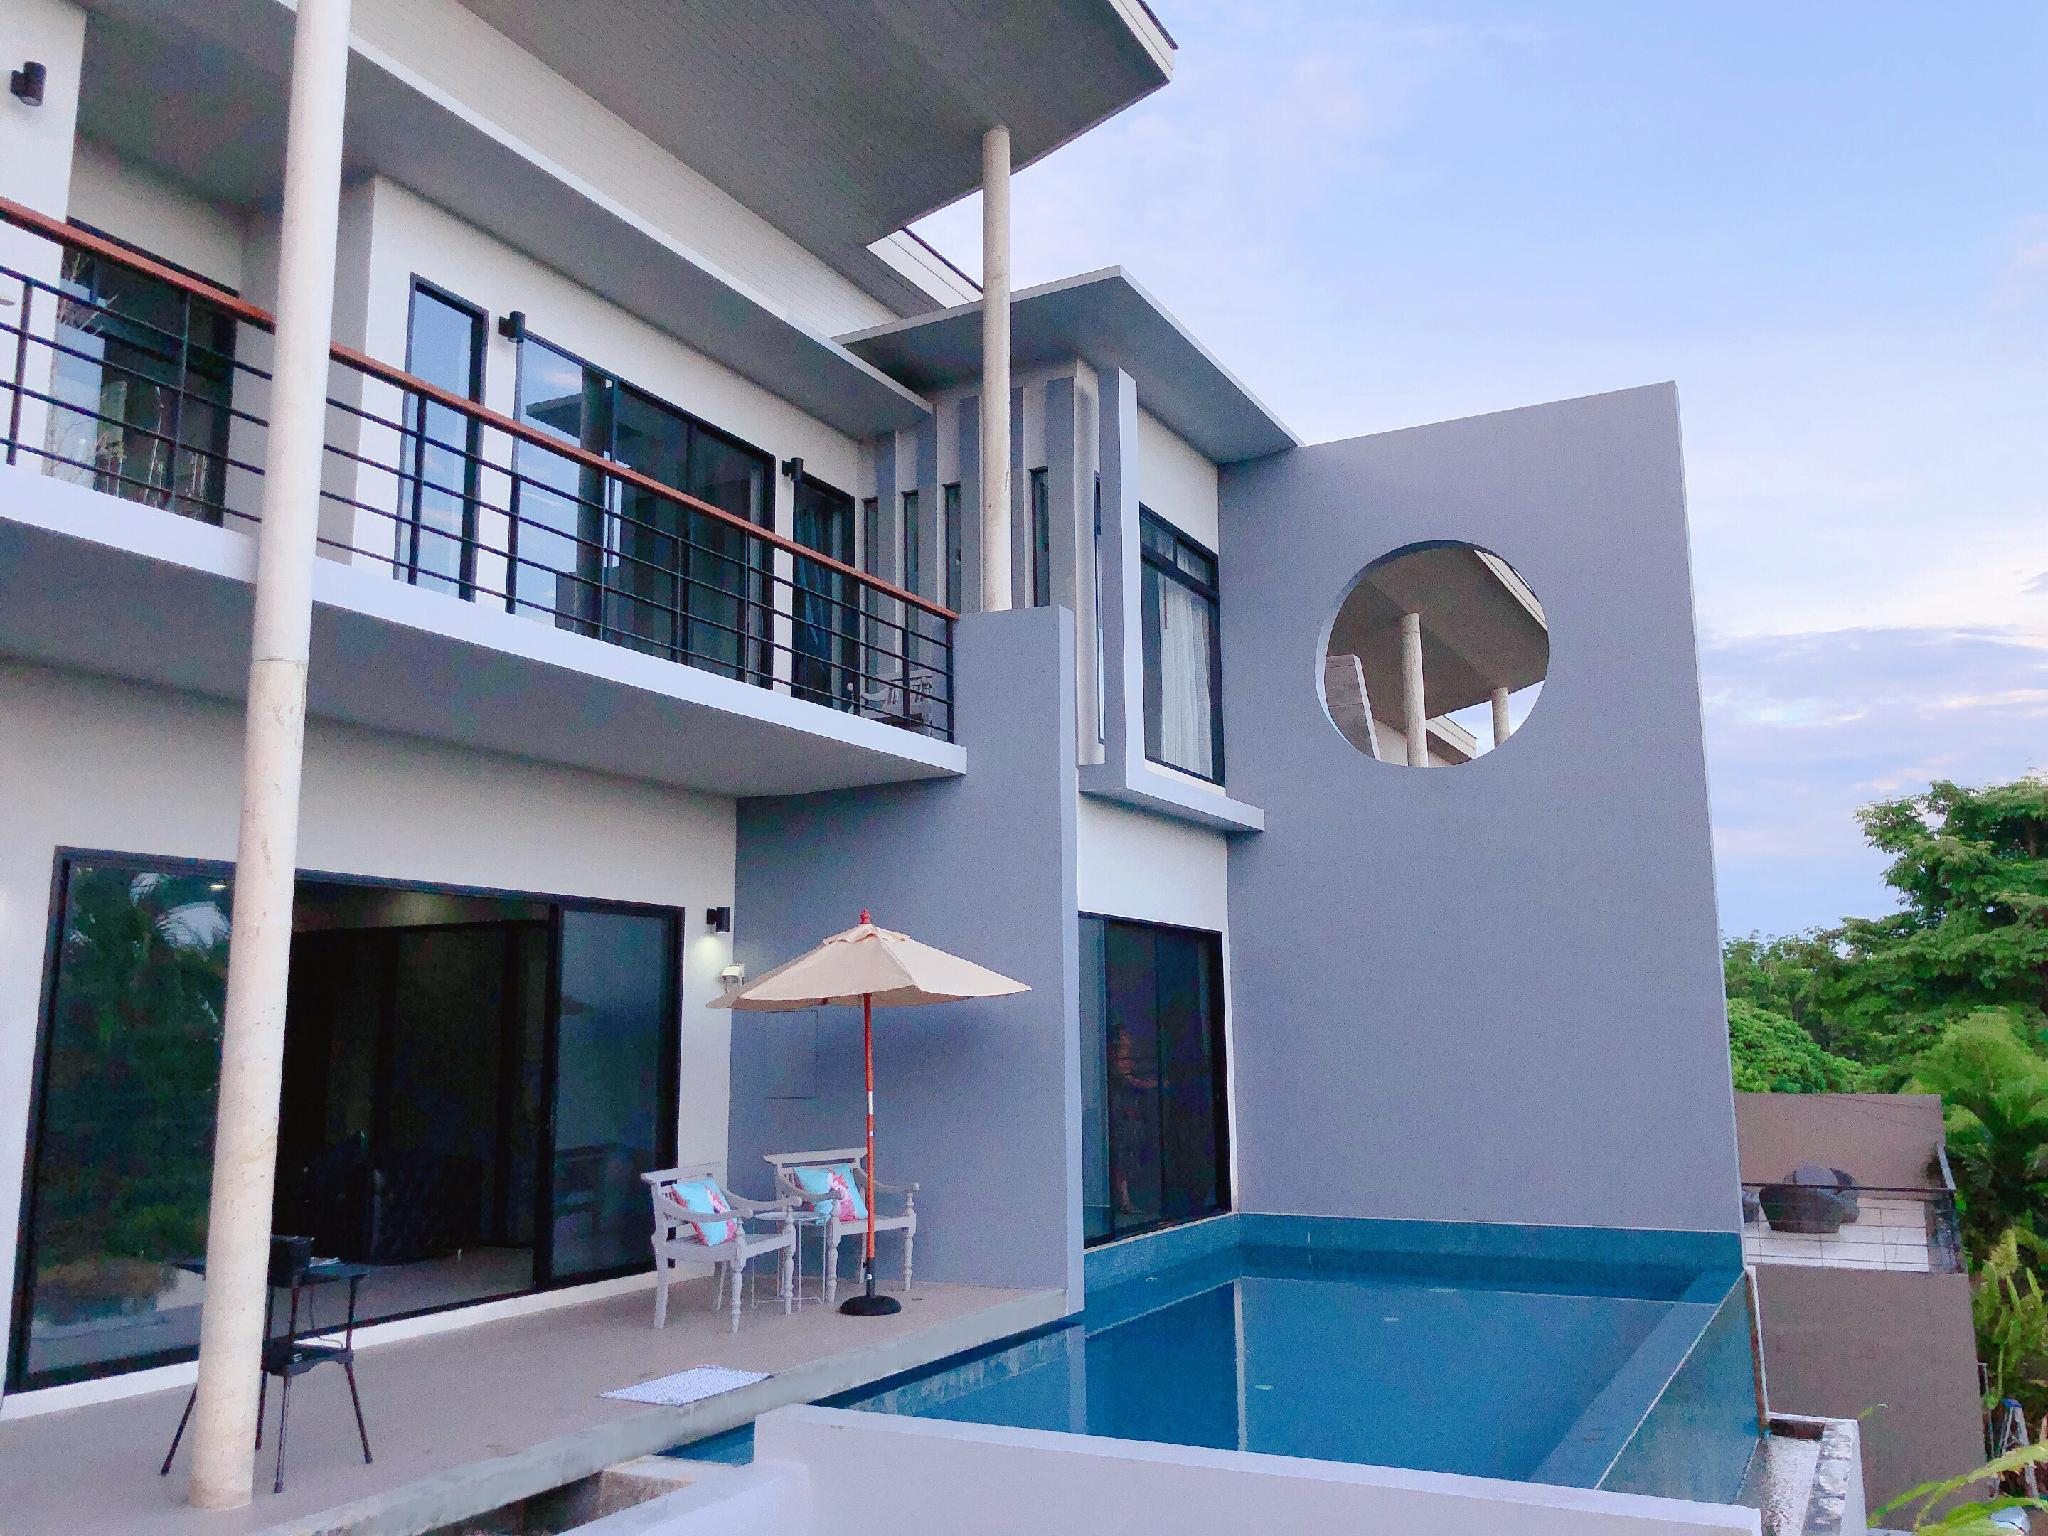 Yun Villa Mid Levels Infinity Pool 4.5 Bedroom